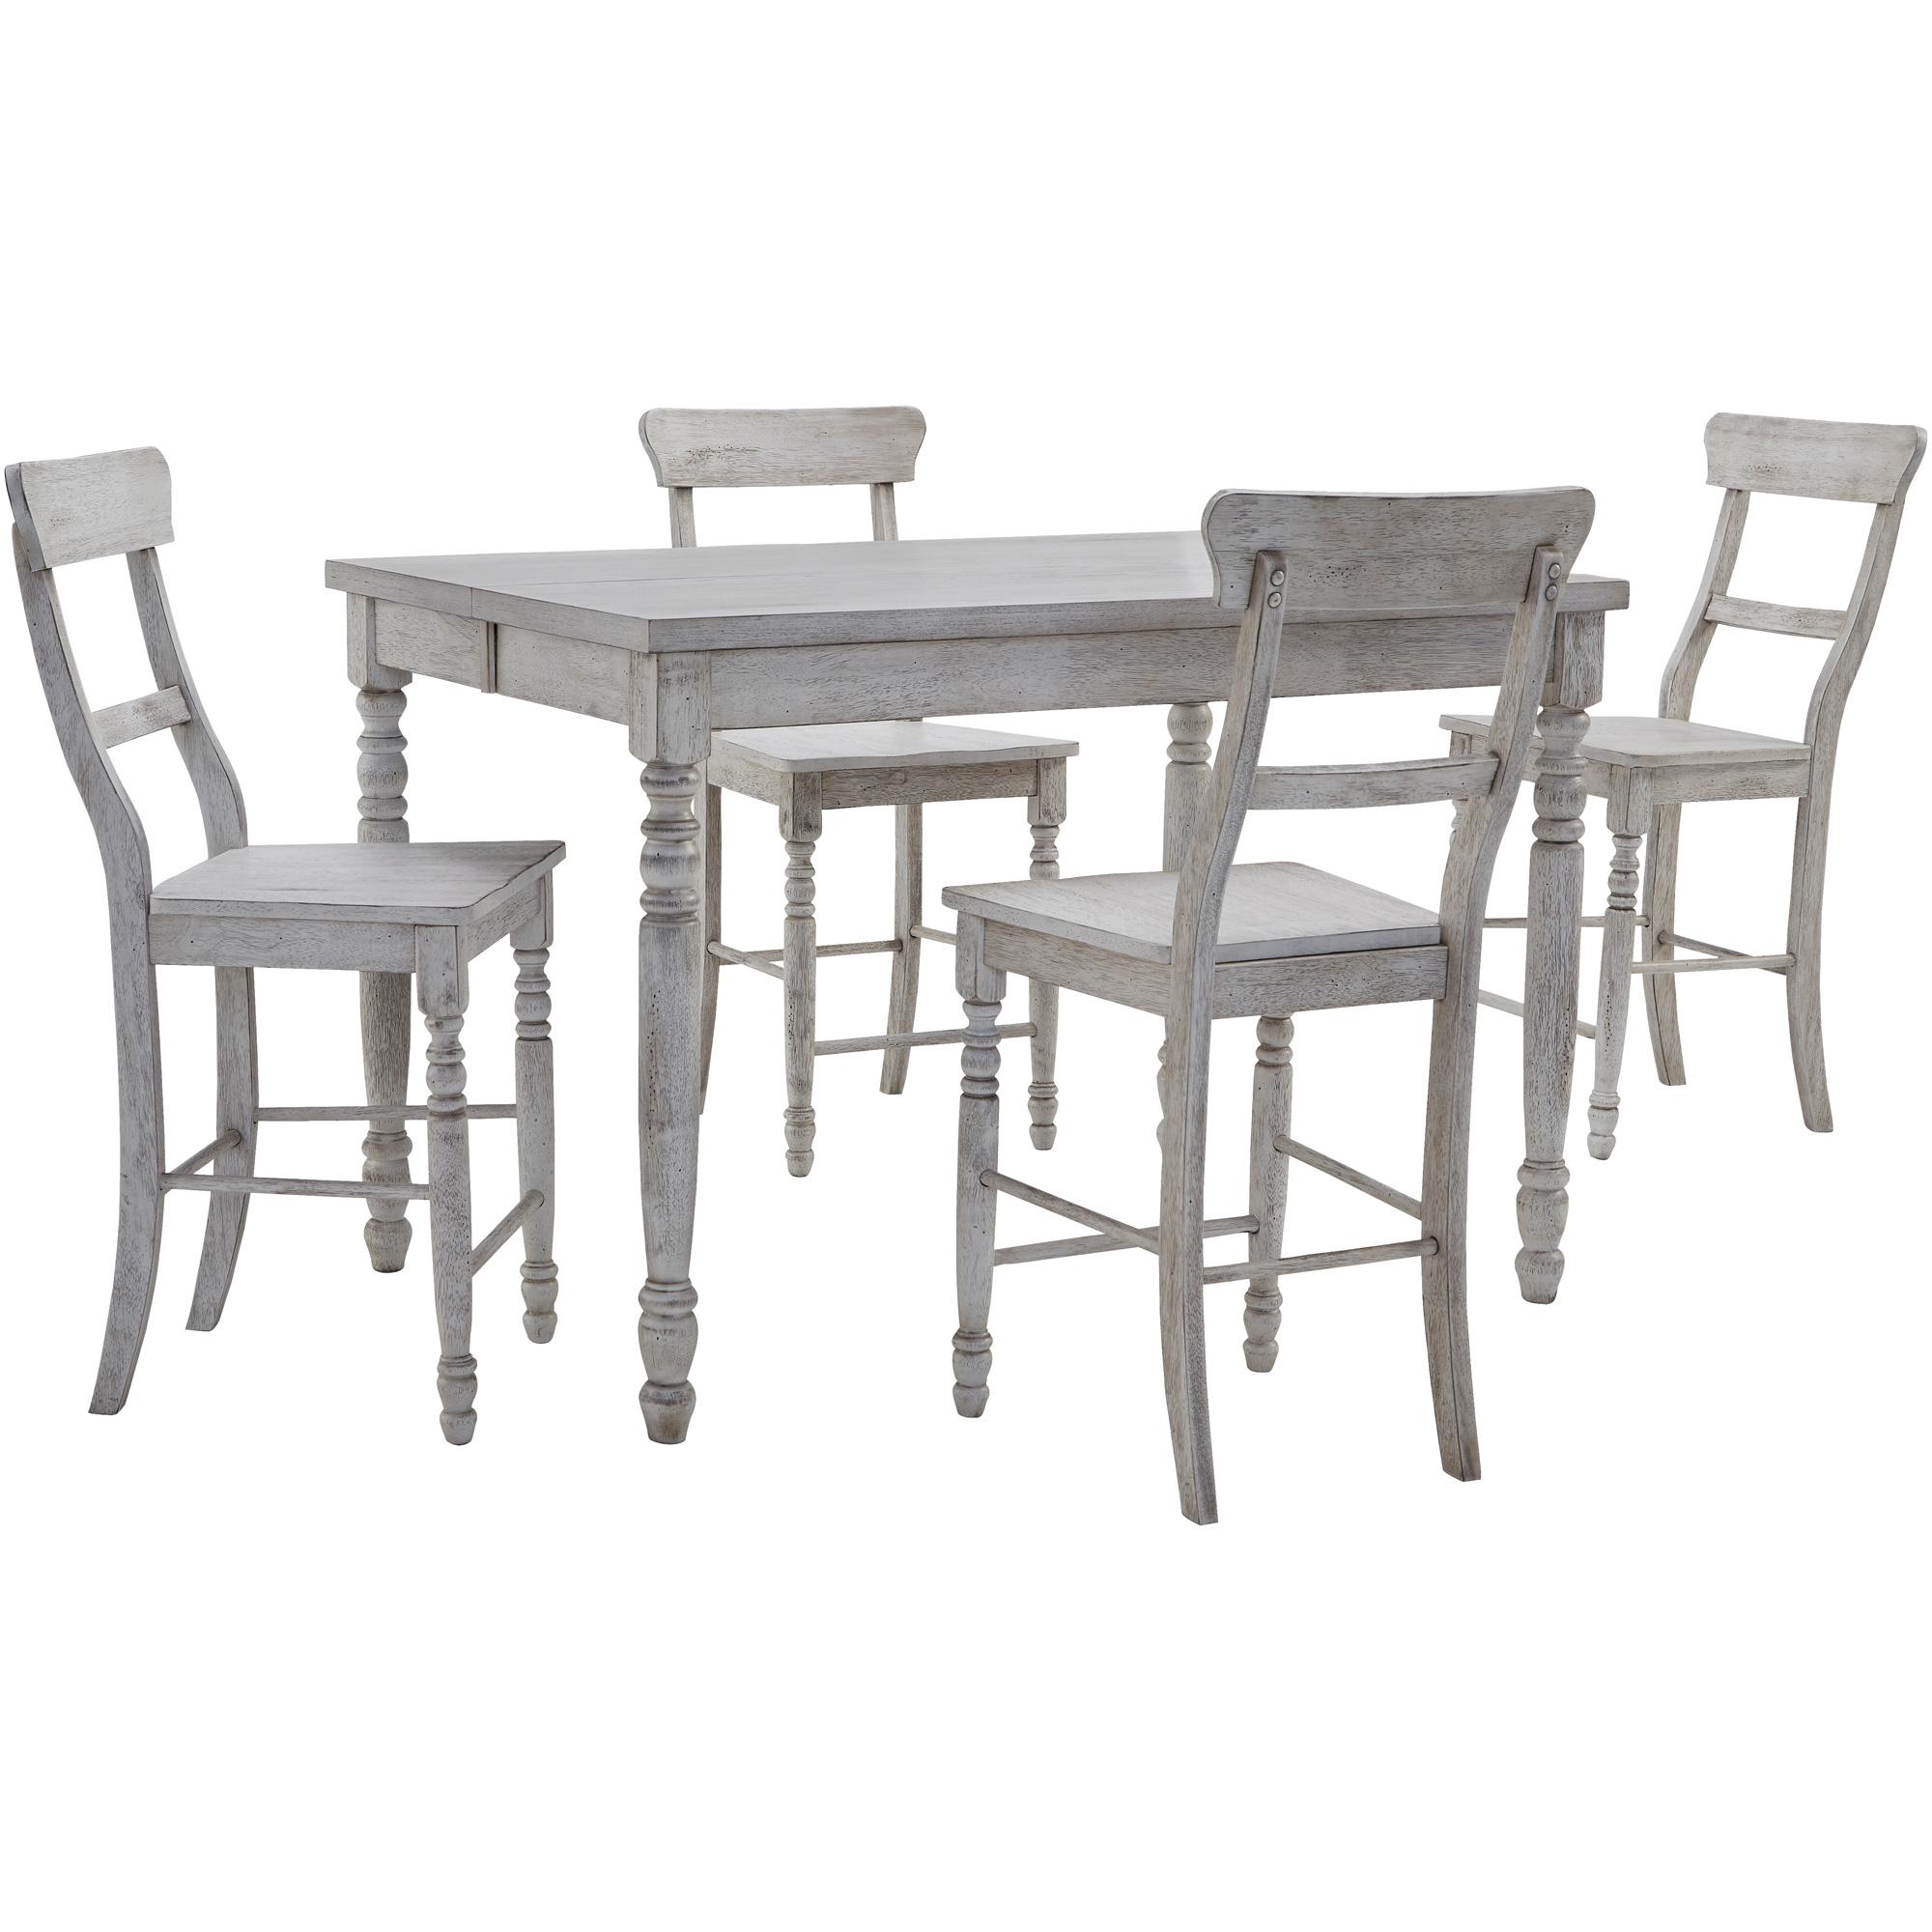 Progressive Furniture Inc. | Savannah Court Antique White 5 Piece Counter Dining Set